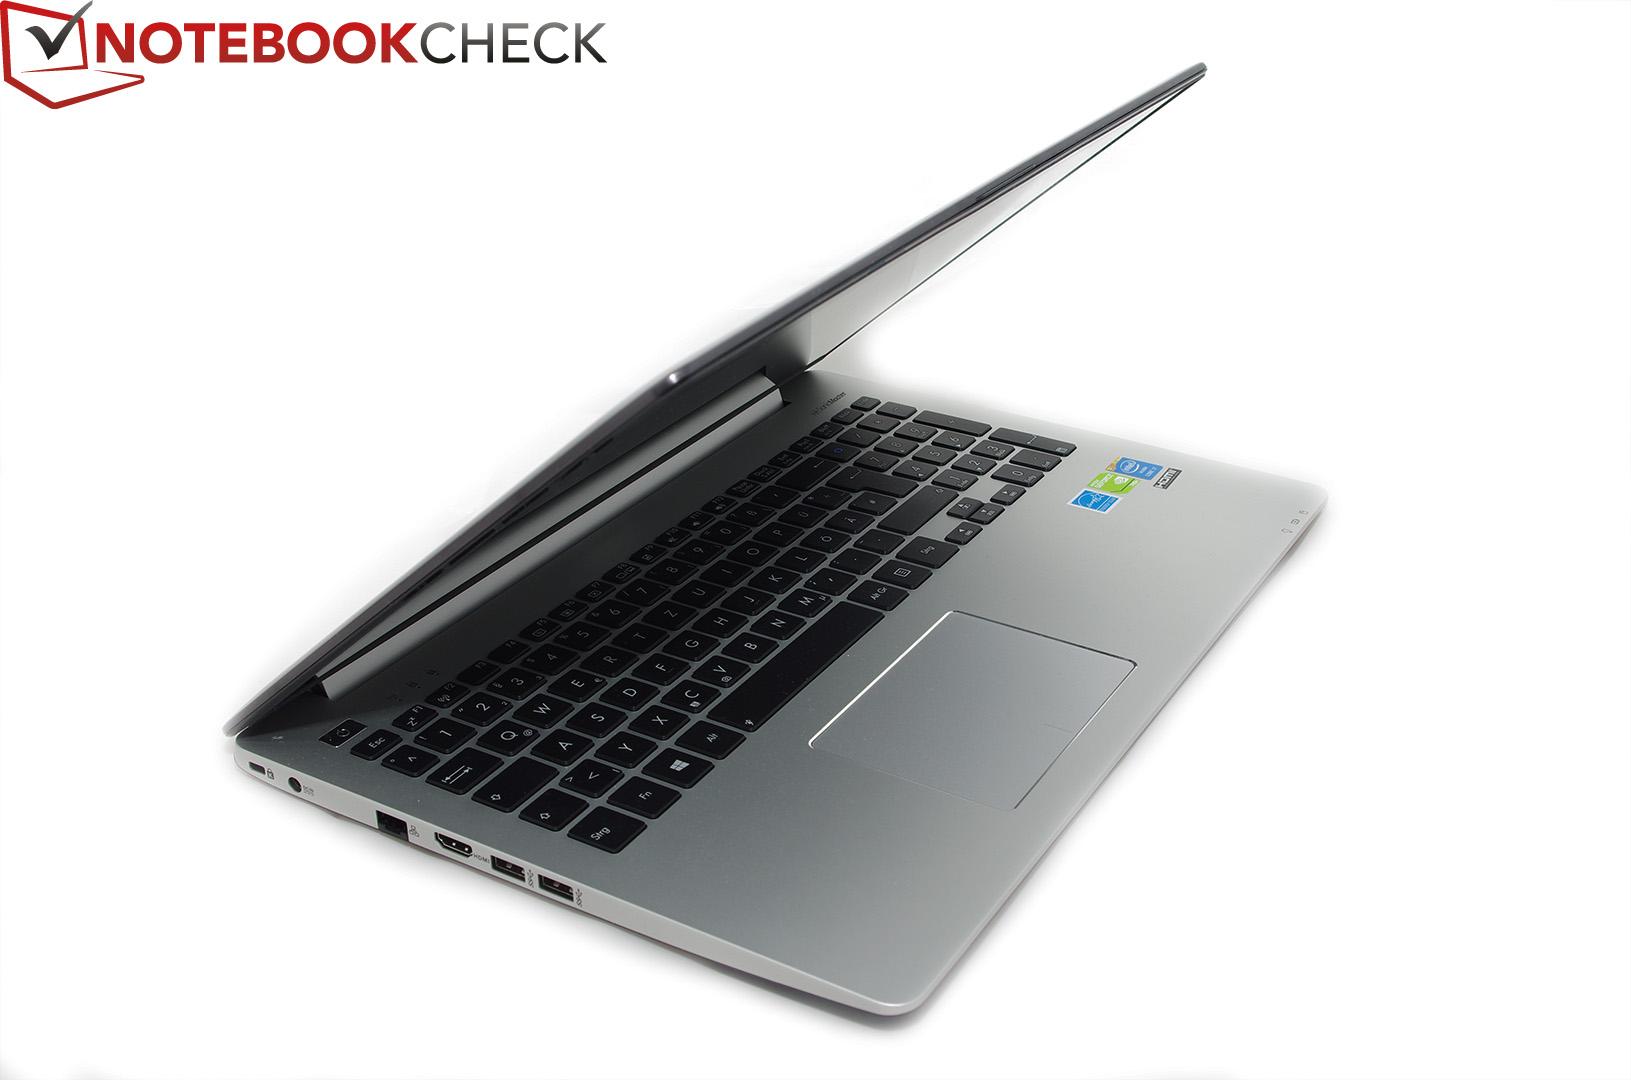 ASUS VivoBook S551LB Windows 8